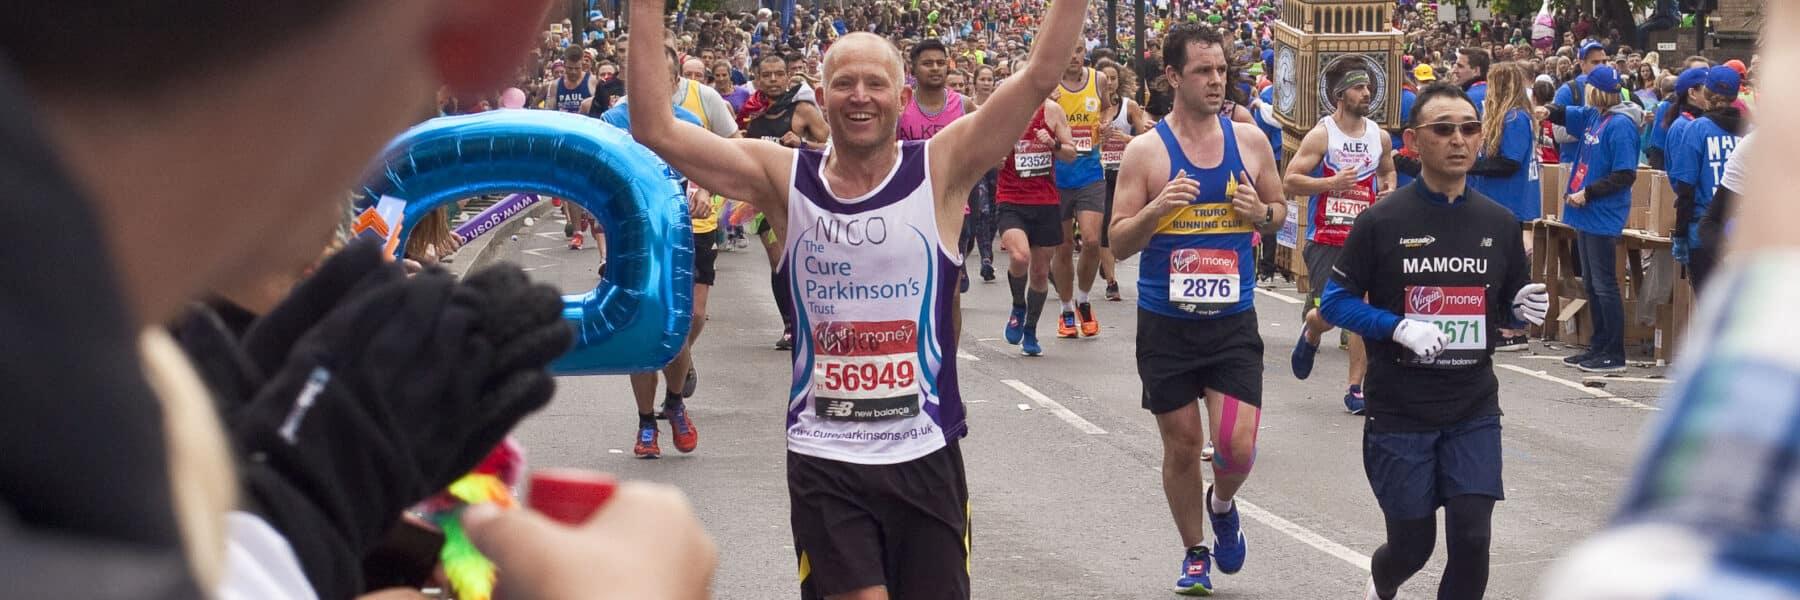 Male Runner London Marathon